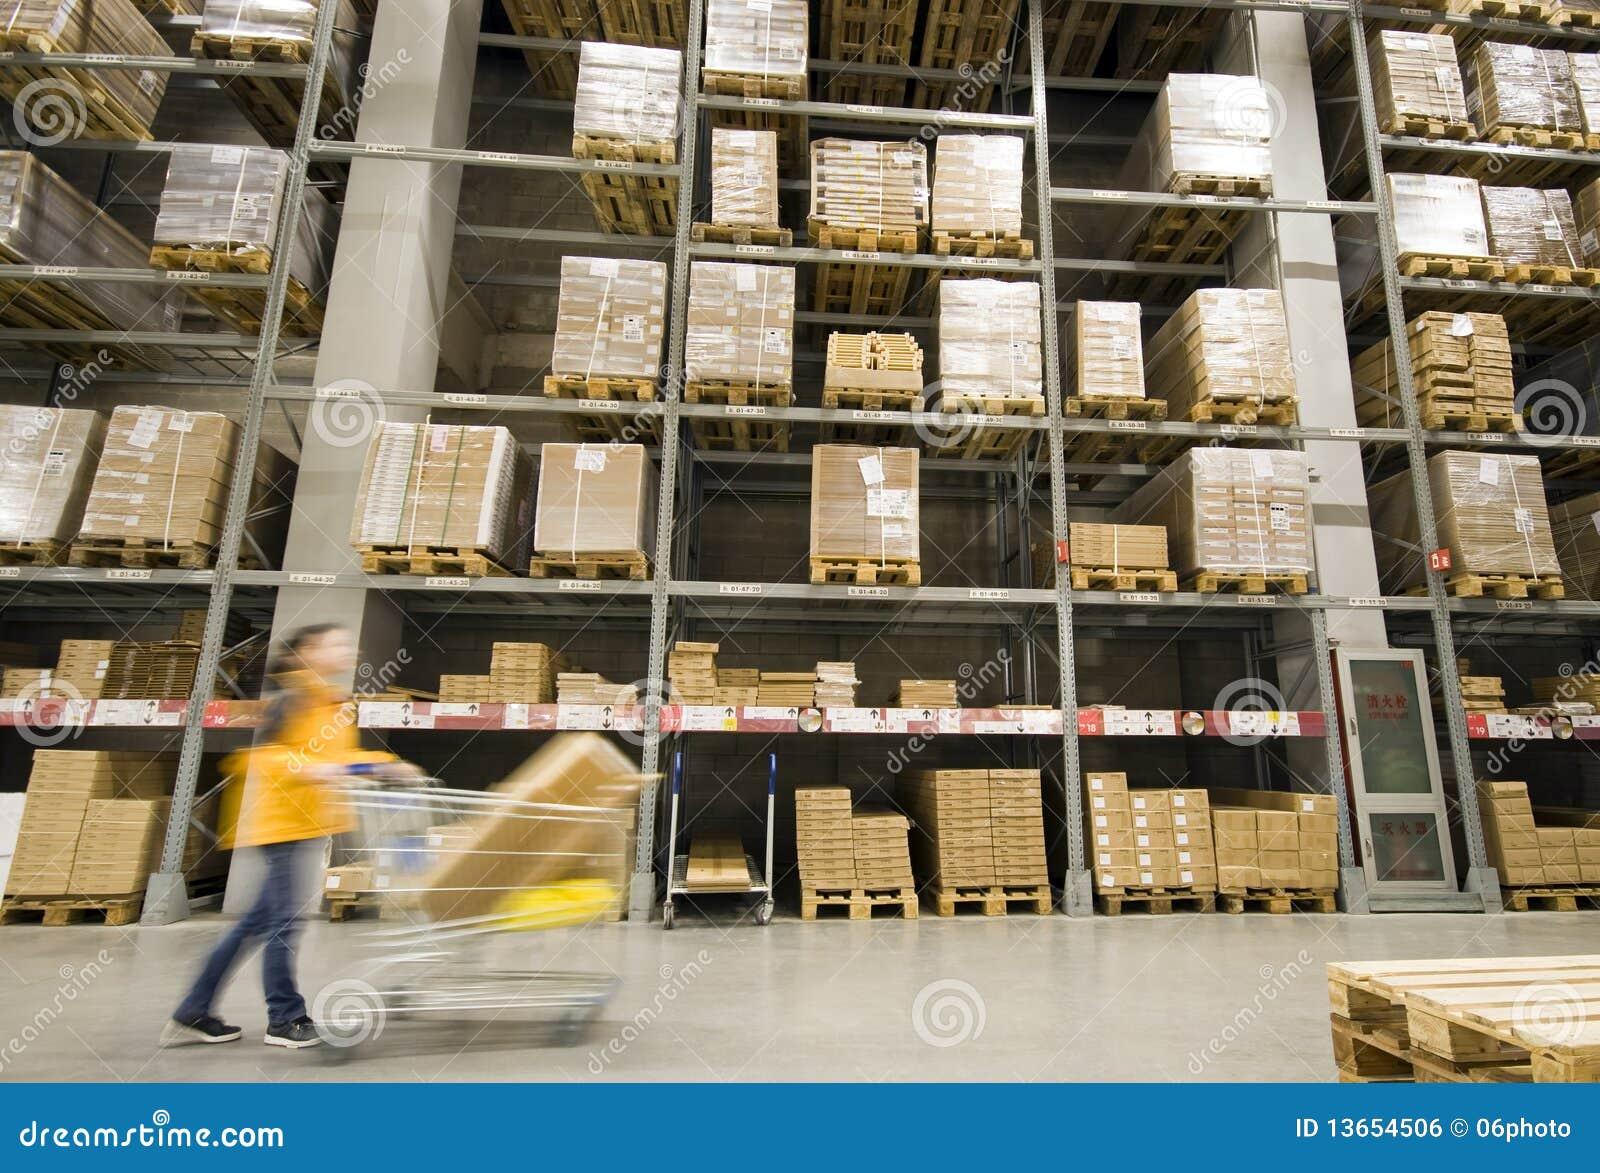 Furniture Warehouse Royalty Free Stock Image Image